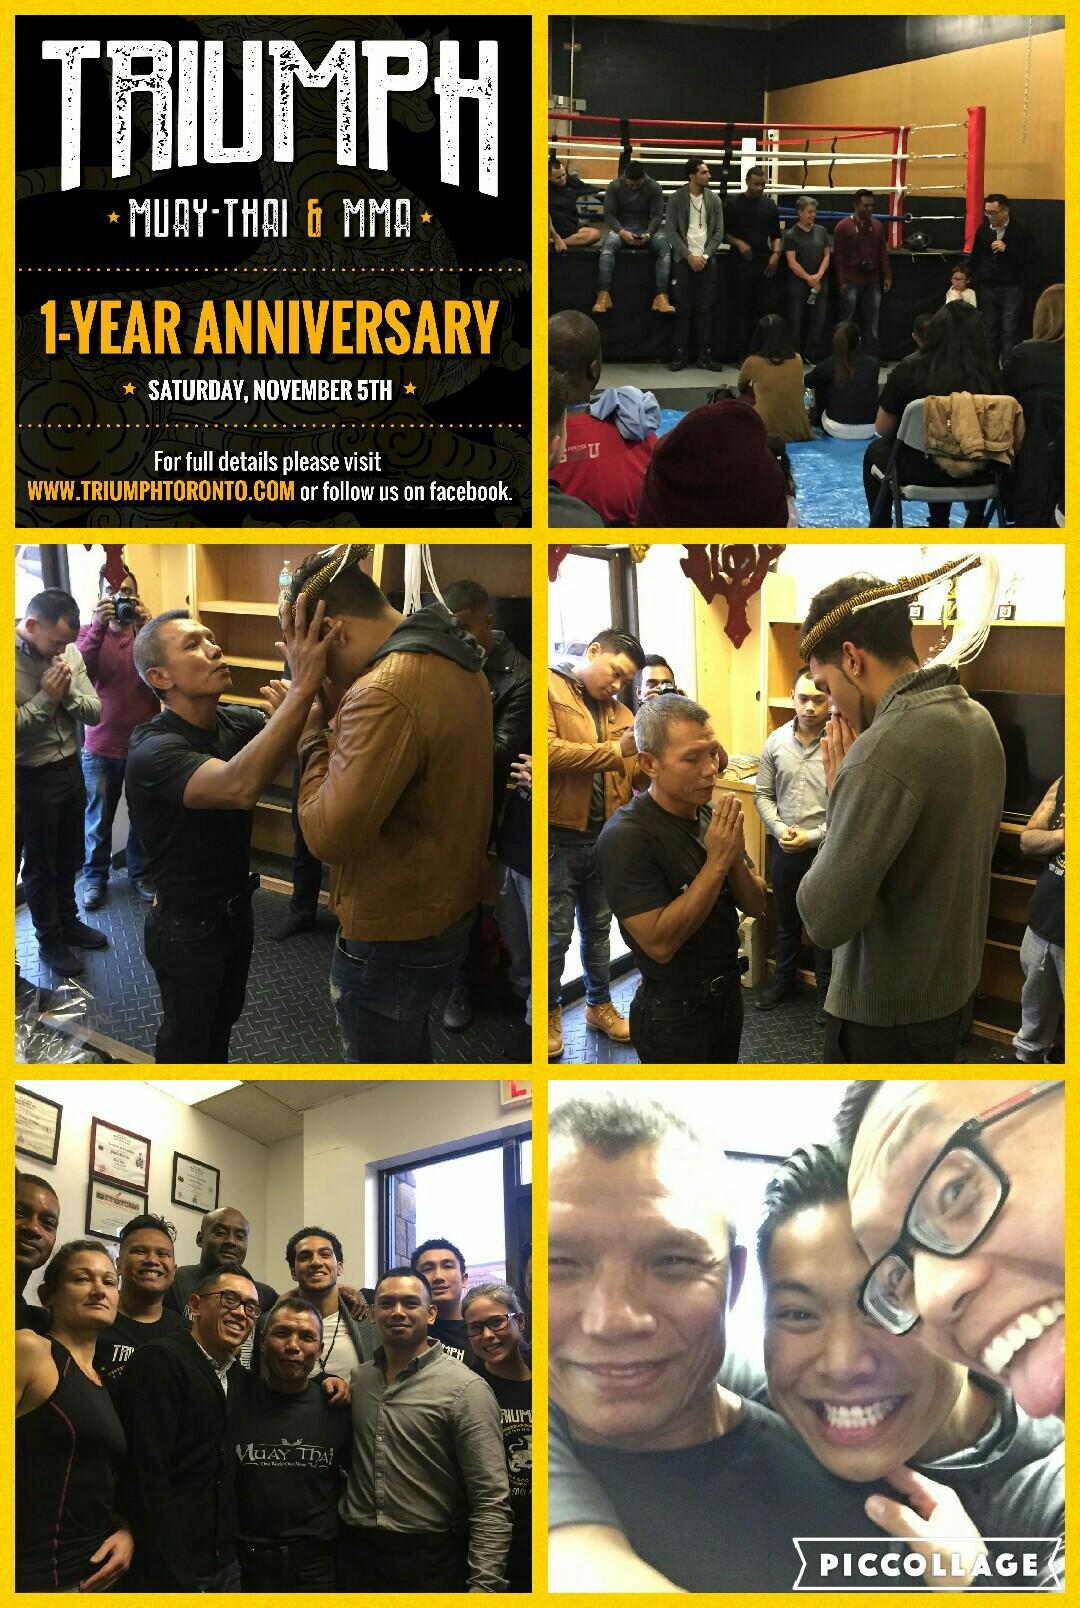 1 YEAR ANNIVERSARY CELEBRATION — Scarborough Triumph Muay-Thai